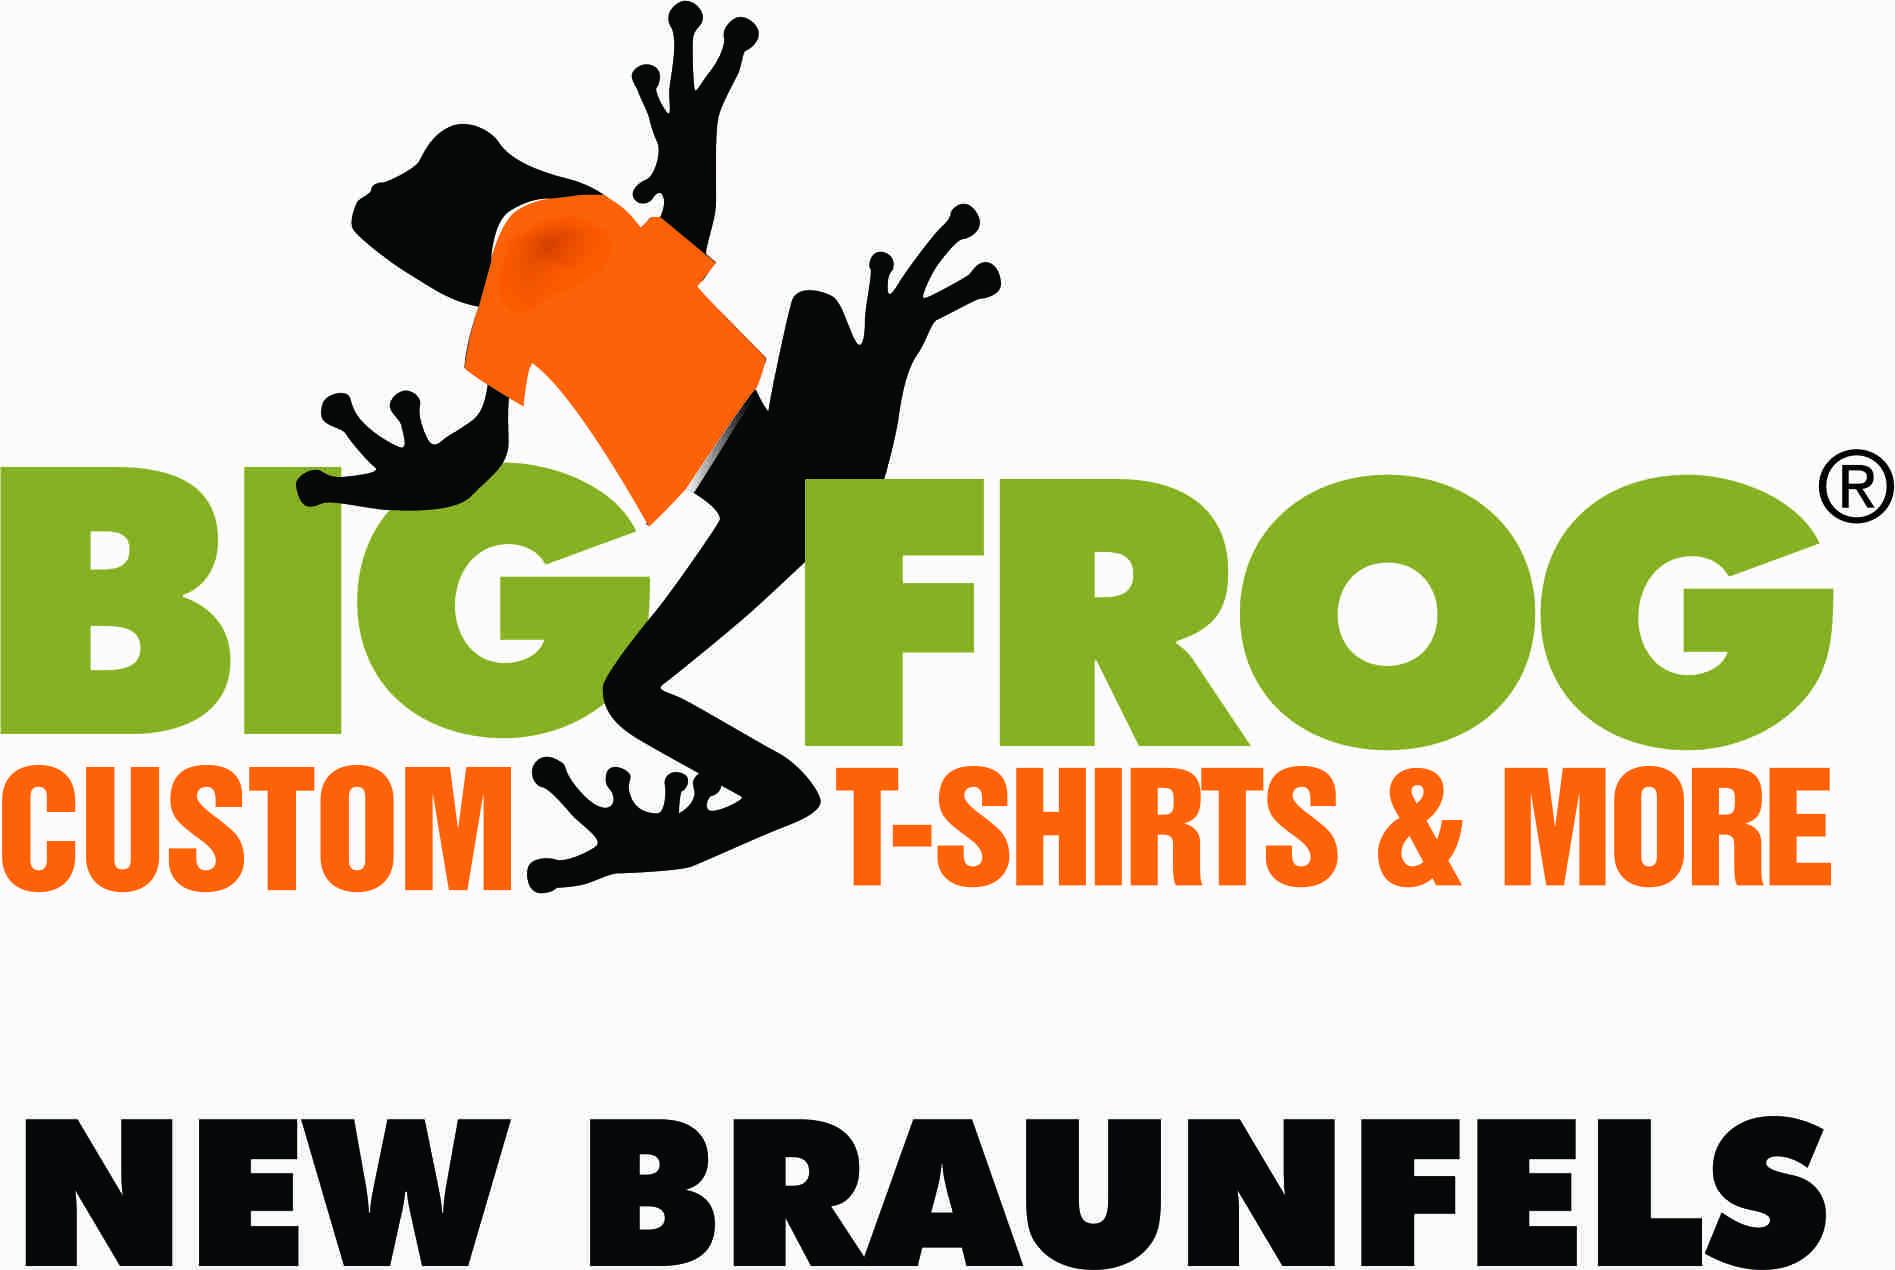 BFNB_logo.jpg